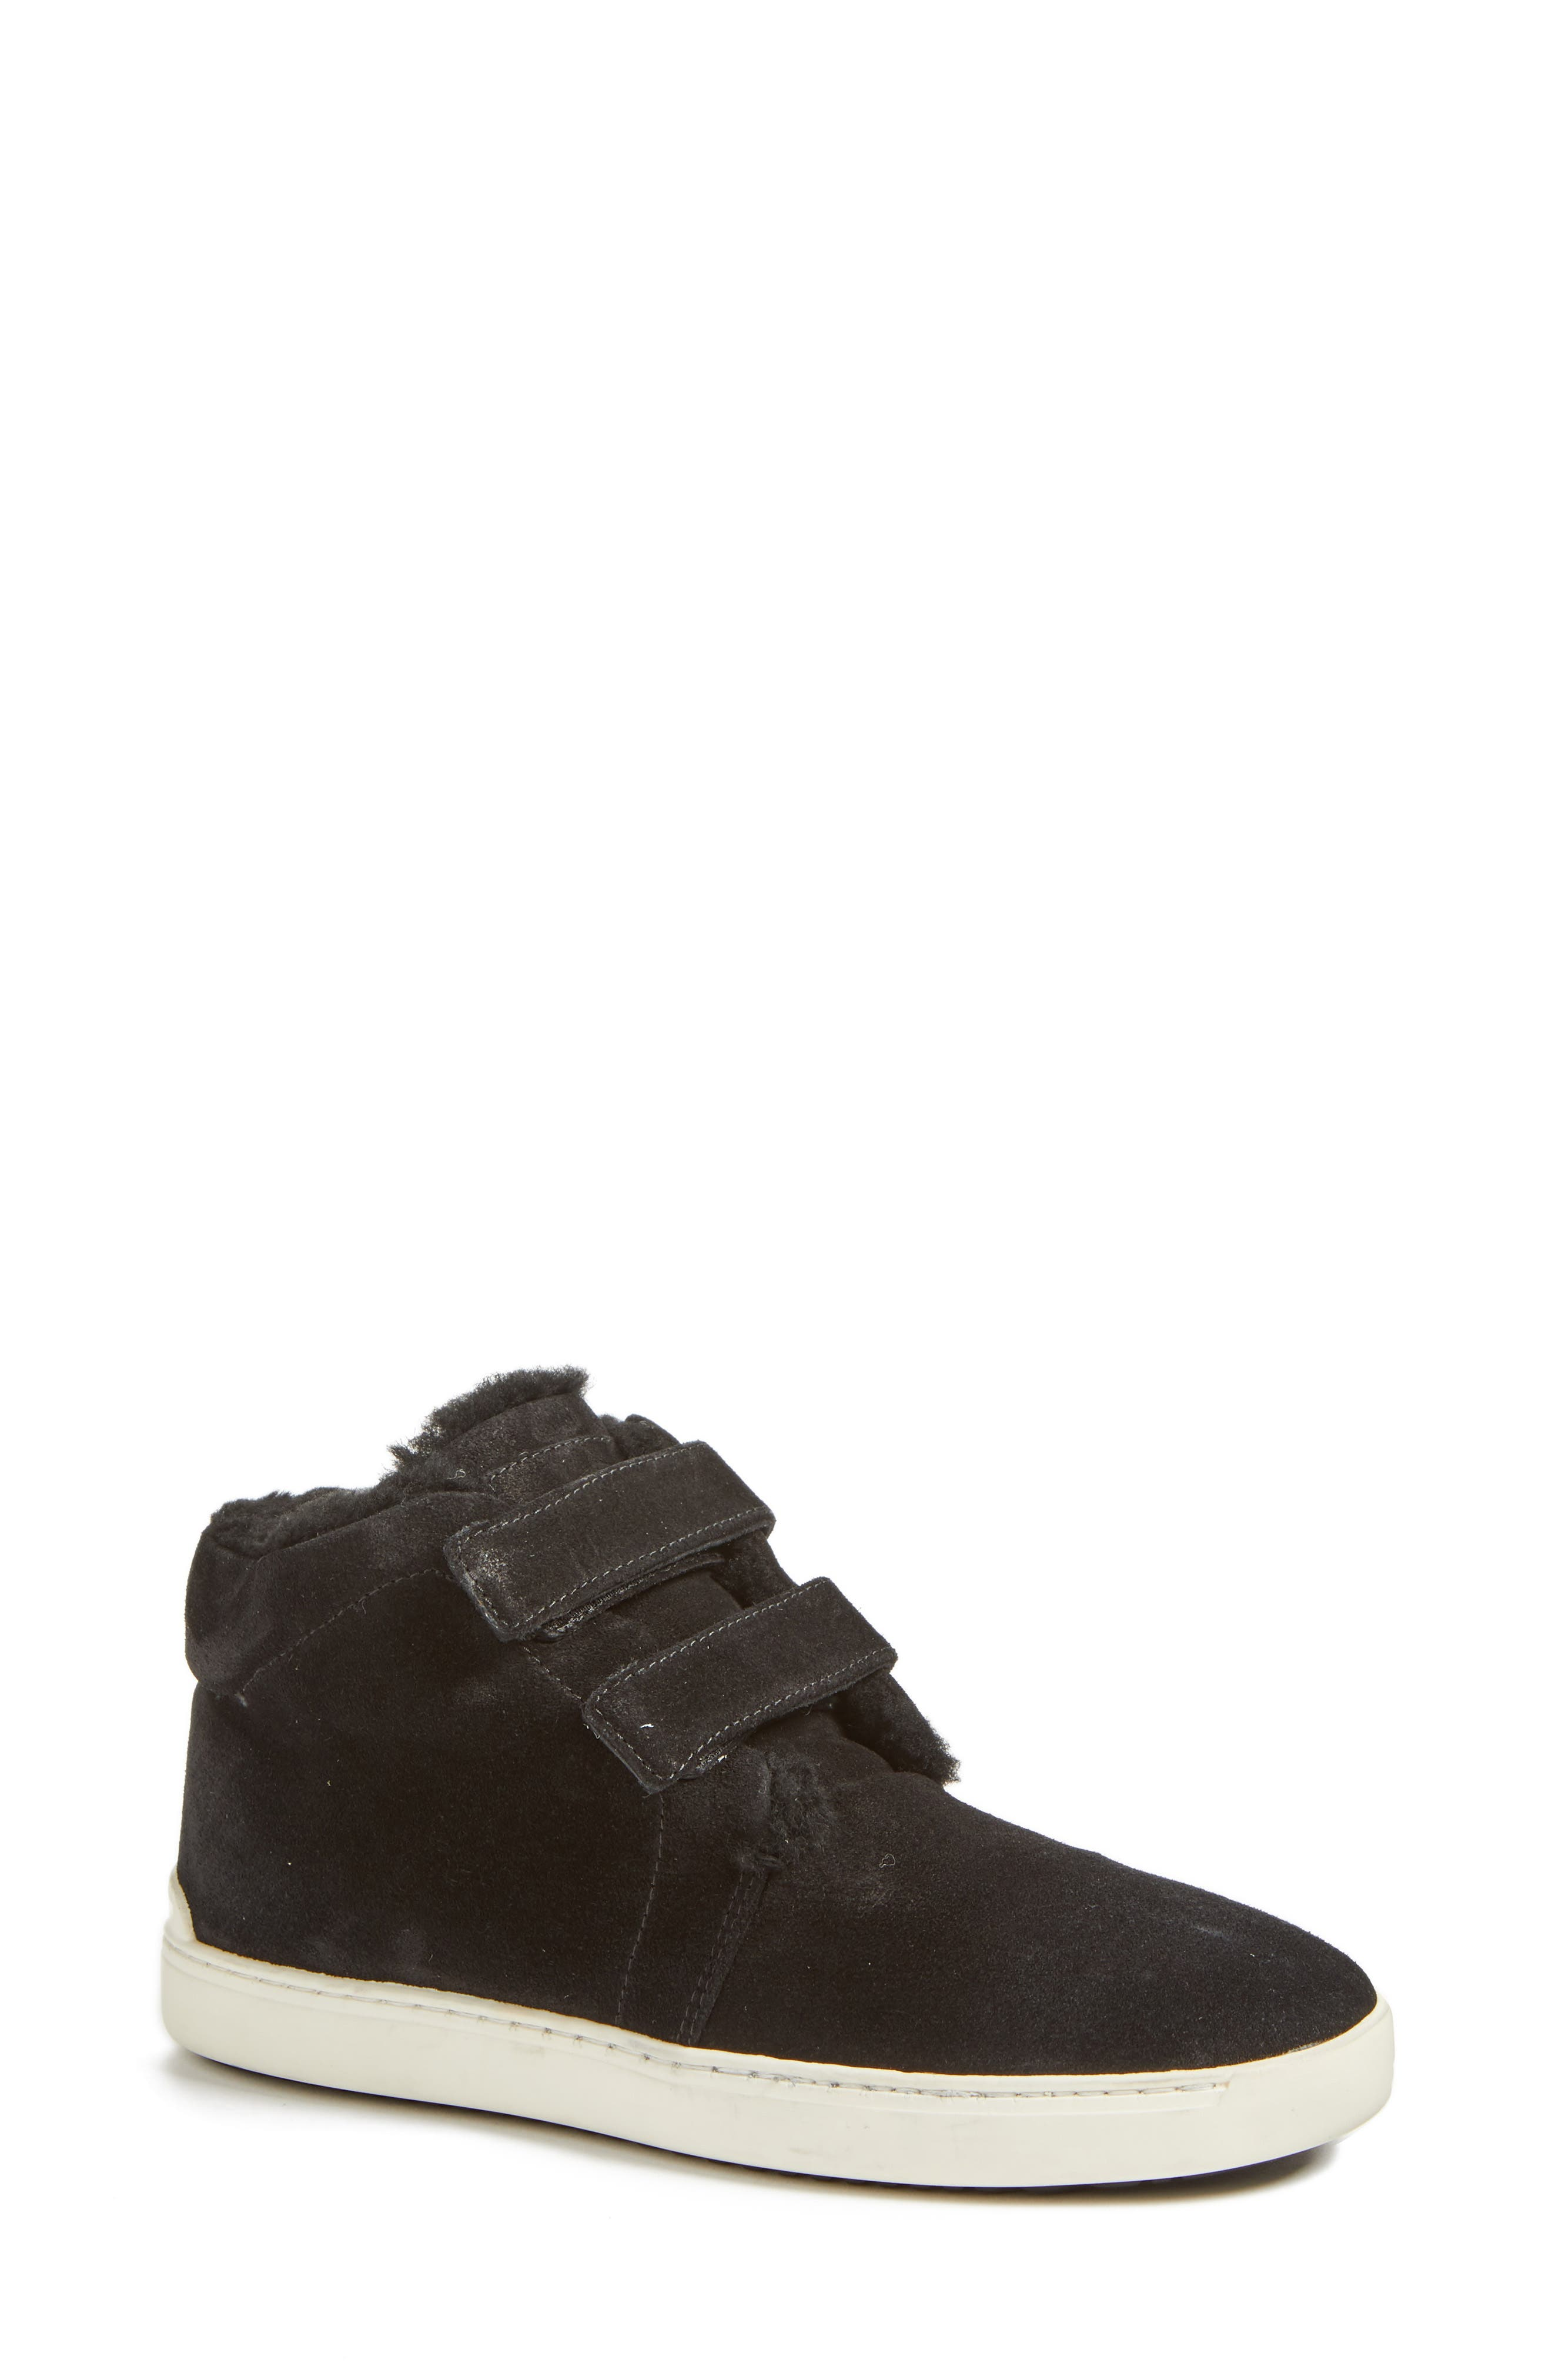 Kent Genuine Shearling Lined Sneaker,                             Main thumbnail 1, color,                             008